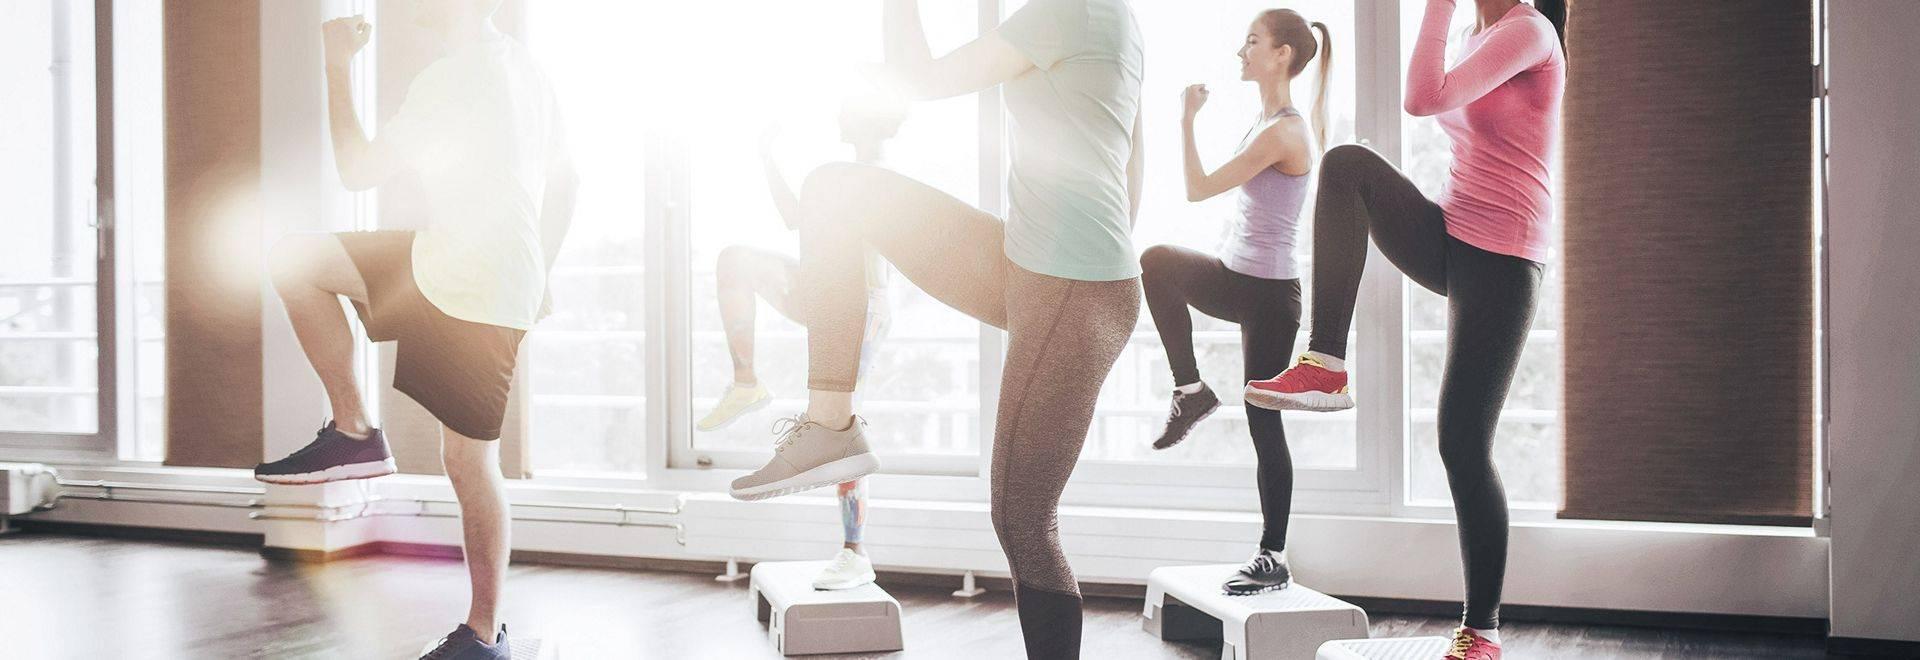 MZ_Group-Fitness_Training_Stepper_Workout.jpg